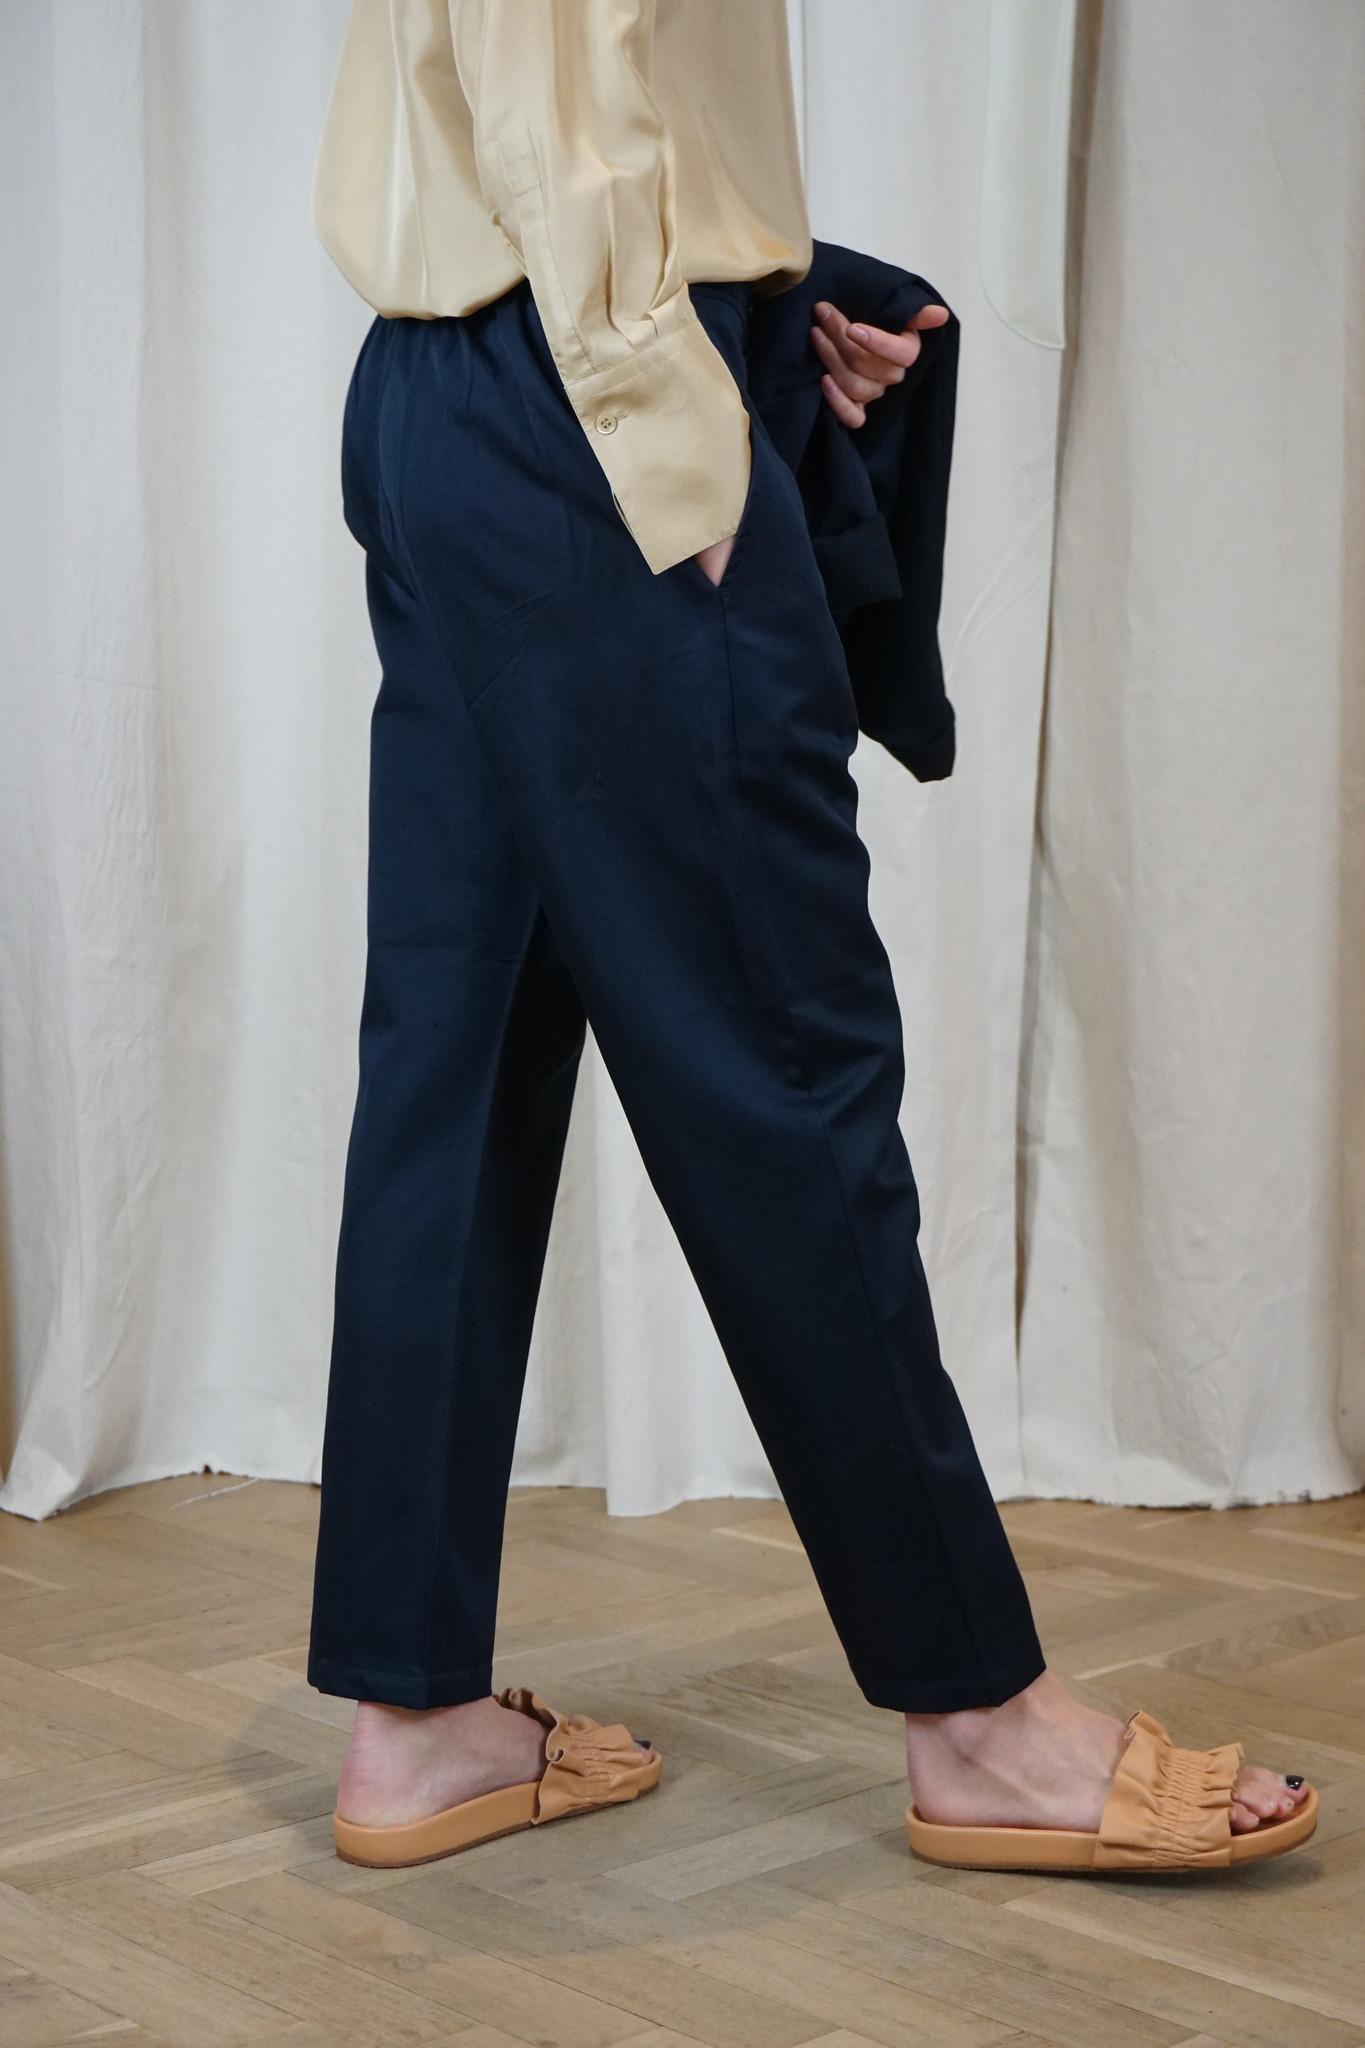 PJ Worker plain Navy cotton linen